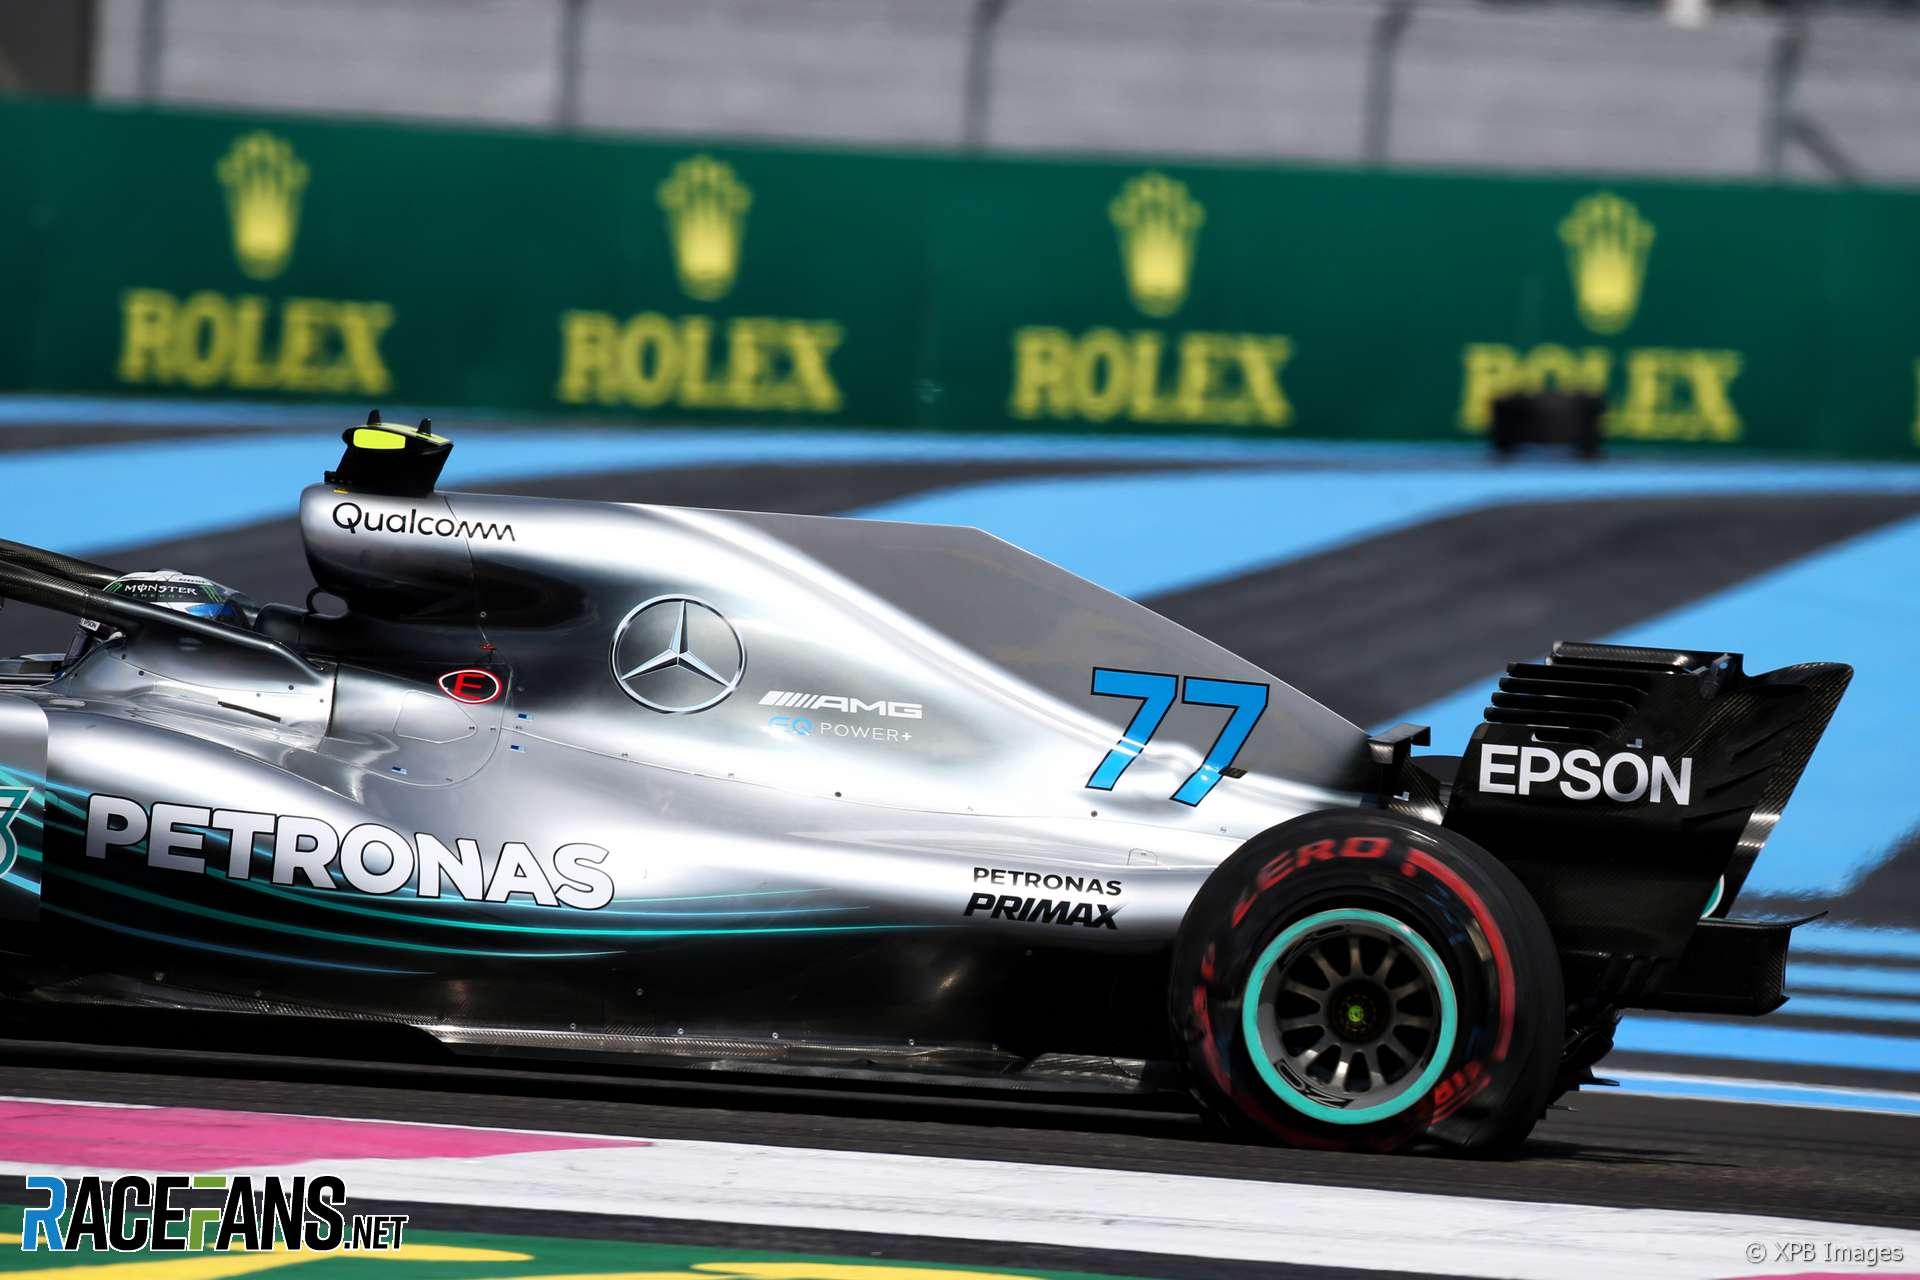 Valtteri Bottas, Mercedes, Paul Ricard, 2018